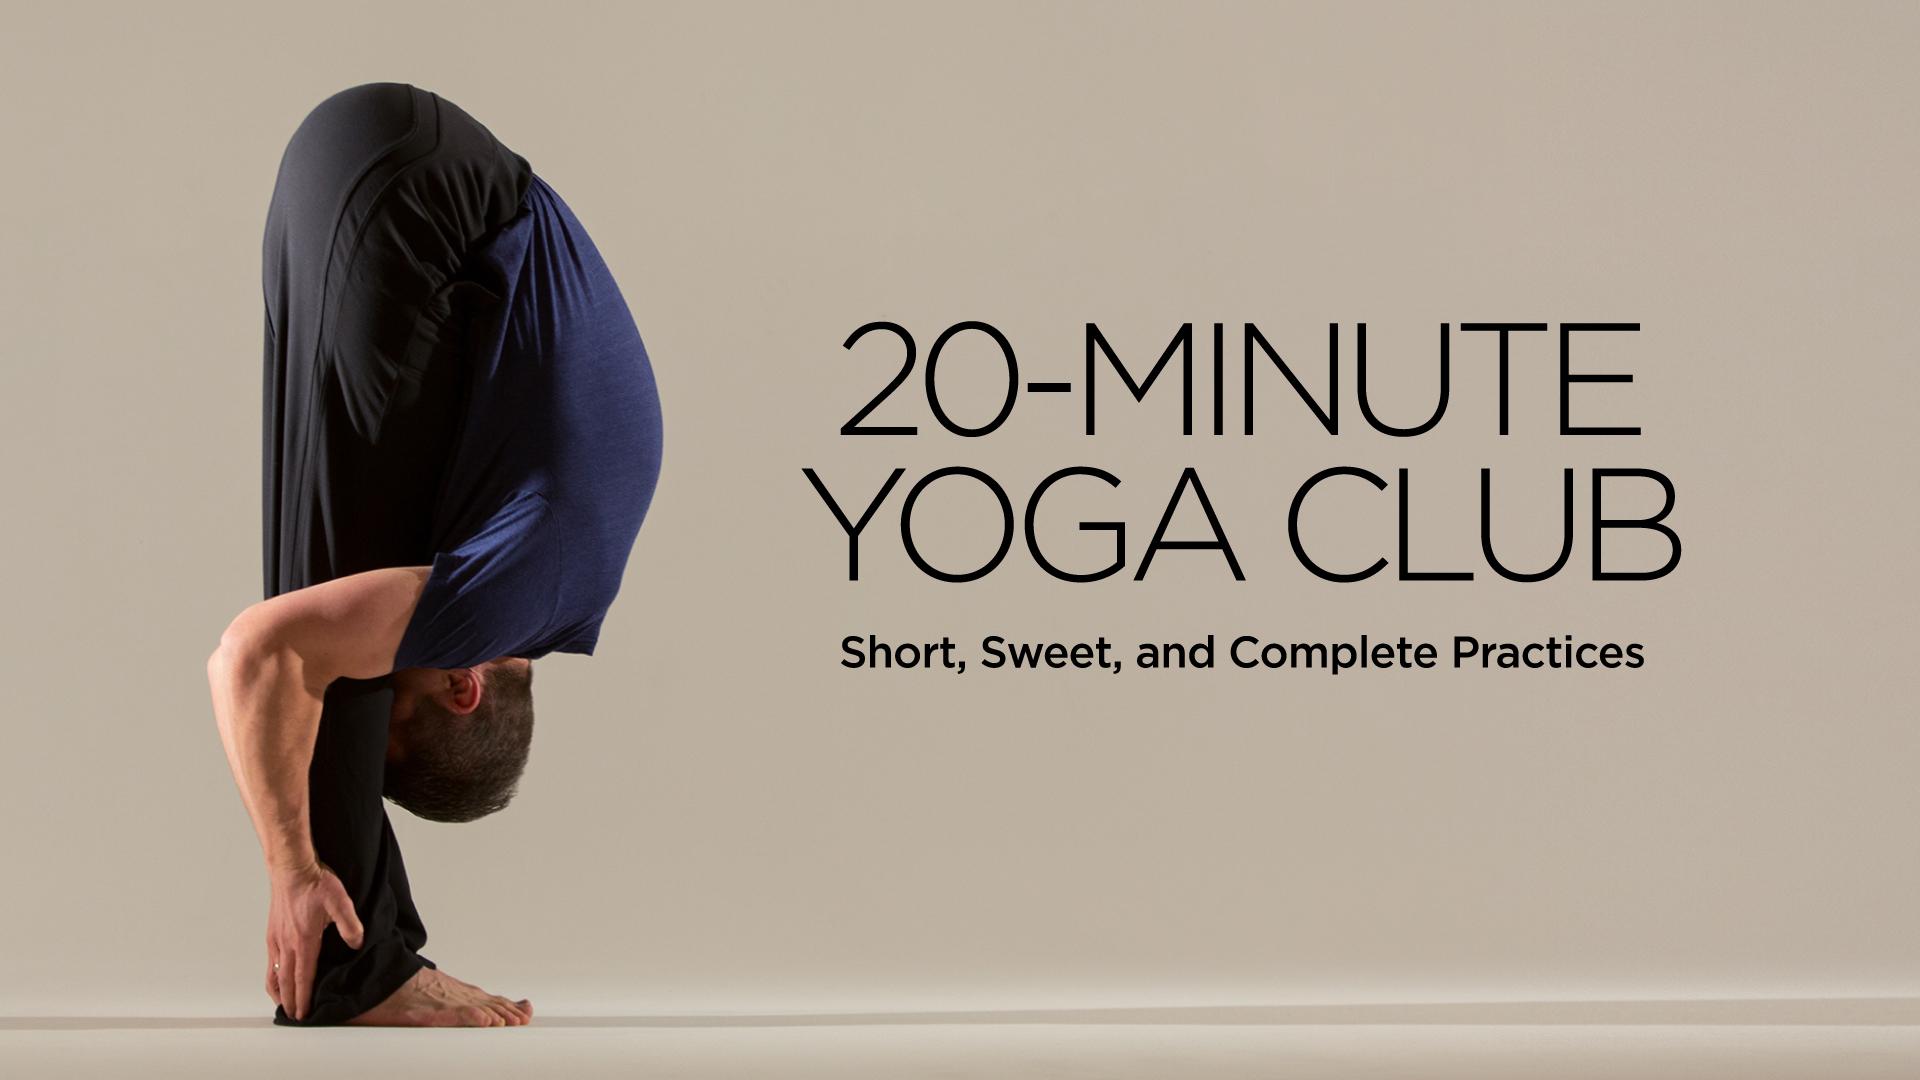 20-Minute Yoga Club | Yoga International